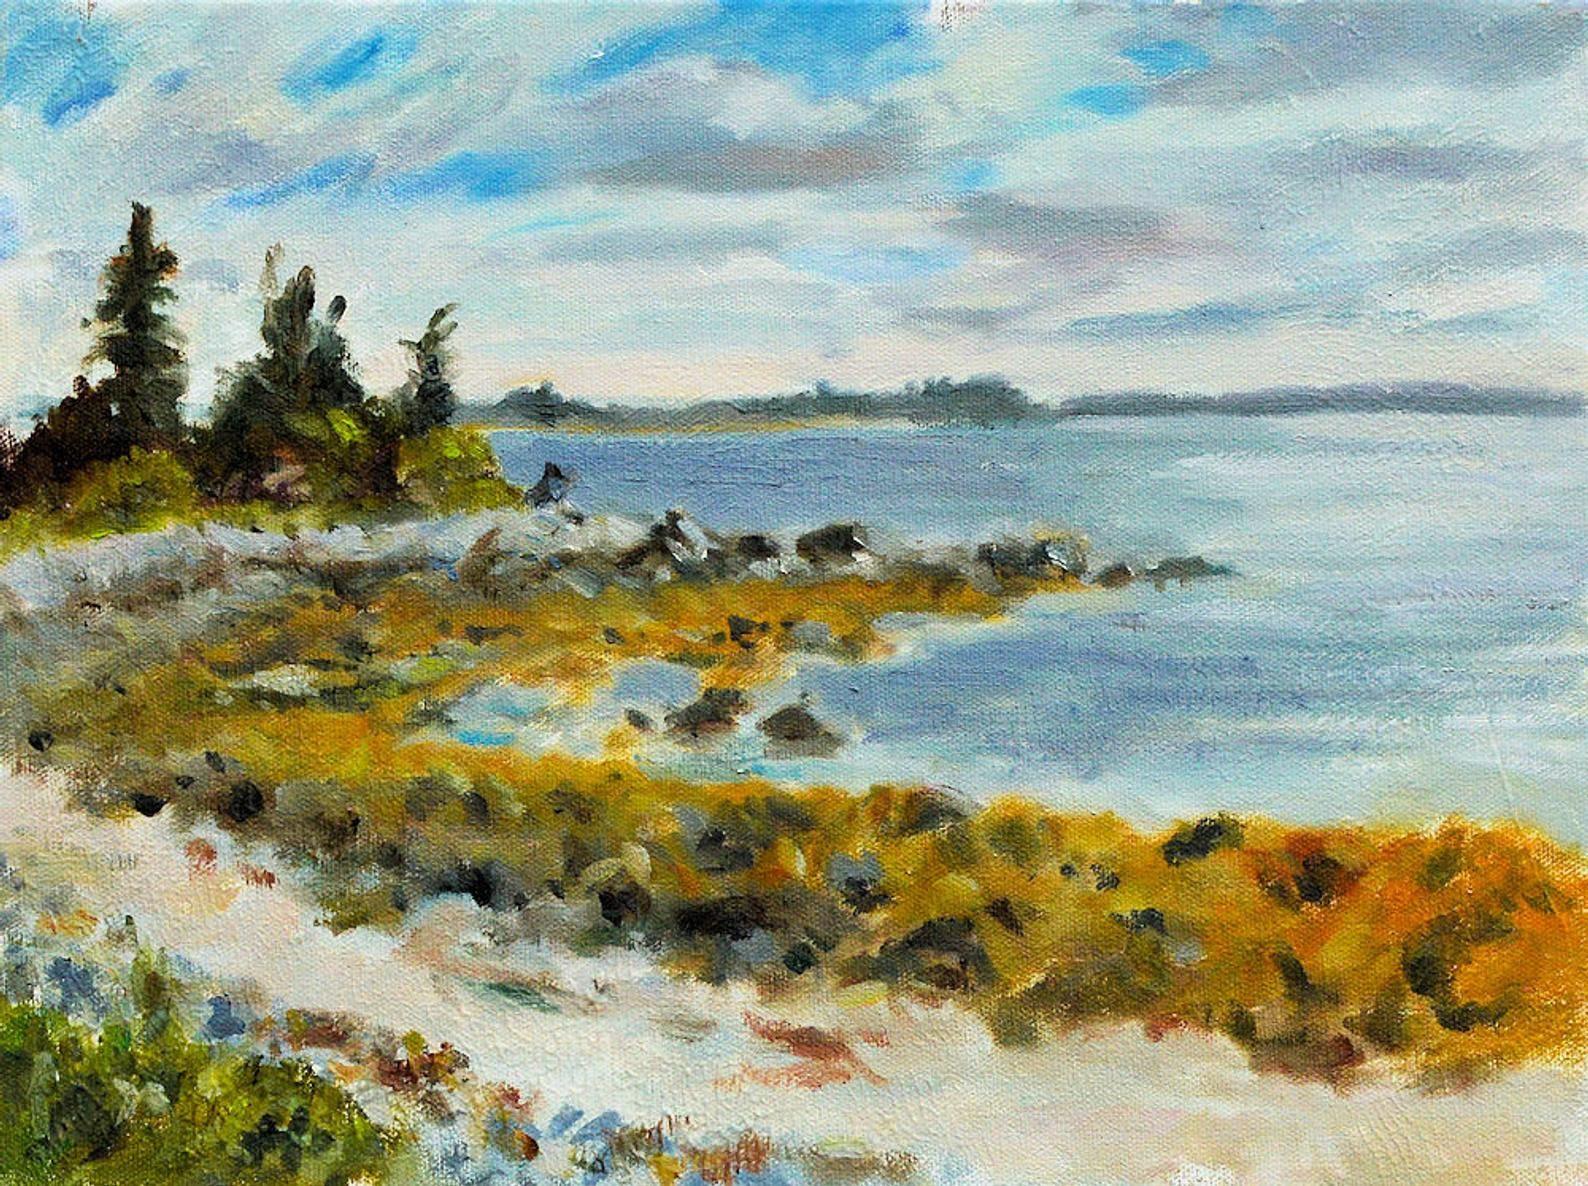 Rocky Cove Nova Scotia Canada Ocean Landscape Beach 12 X Etsy Watercolor Landscape Paintings Ocean Landscape Landscape Paintings